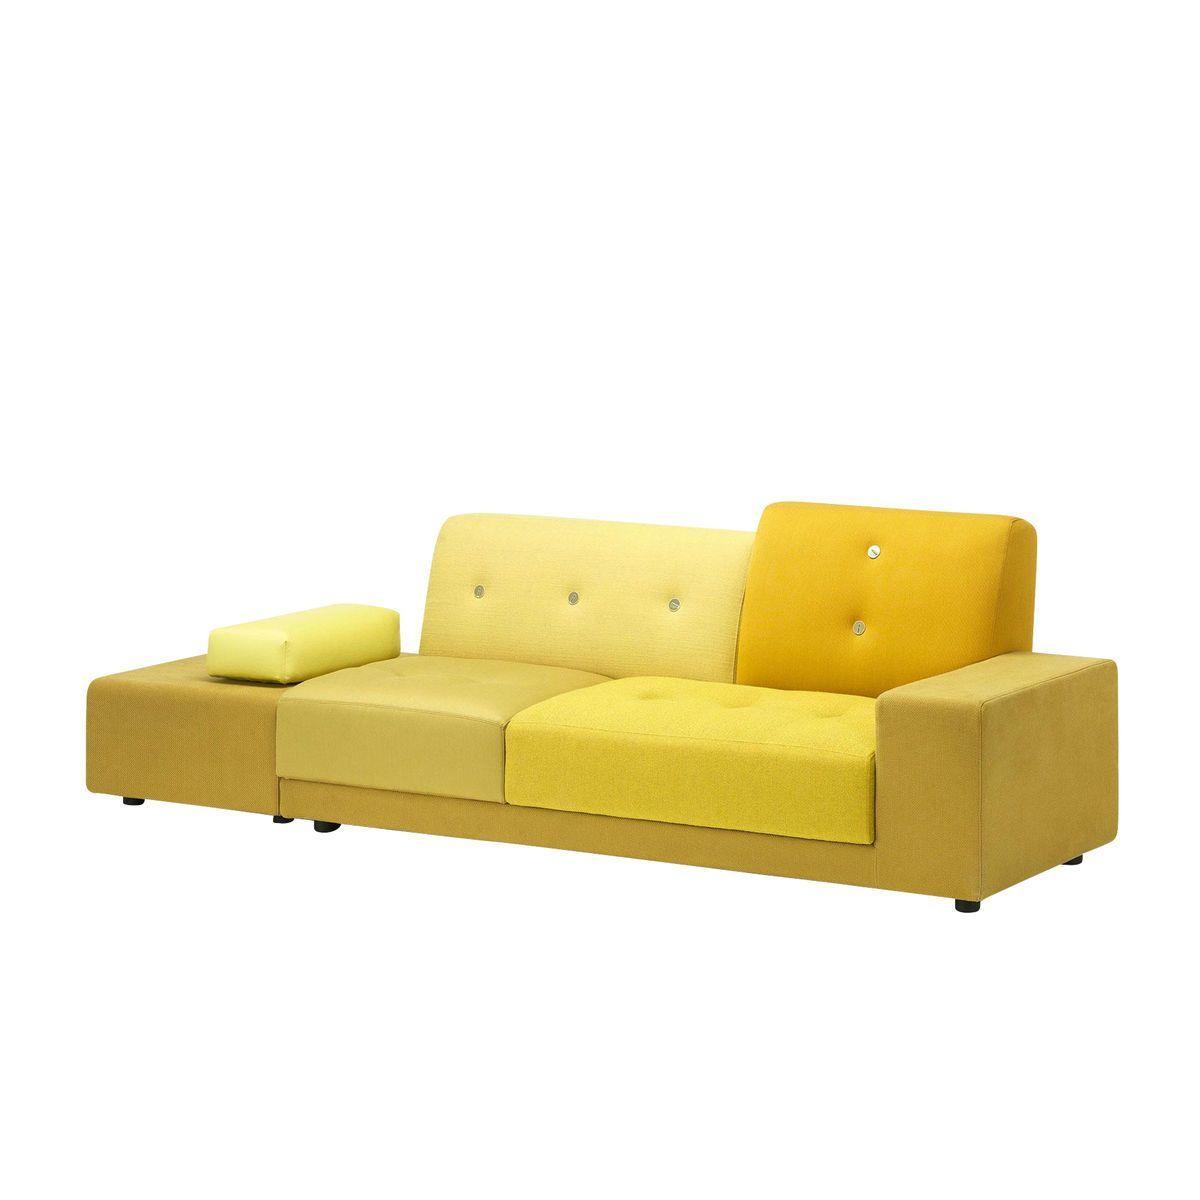 polder sofa vitra. Black Bedroom Furniture Sets. Home Design Ideas